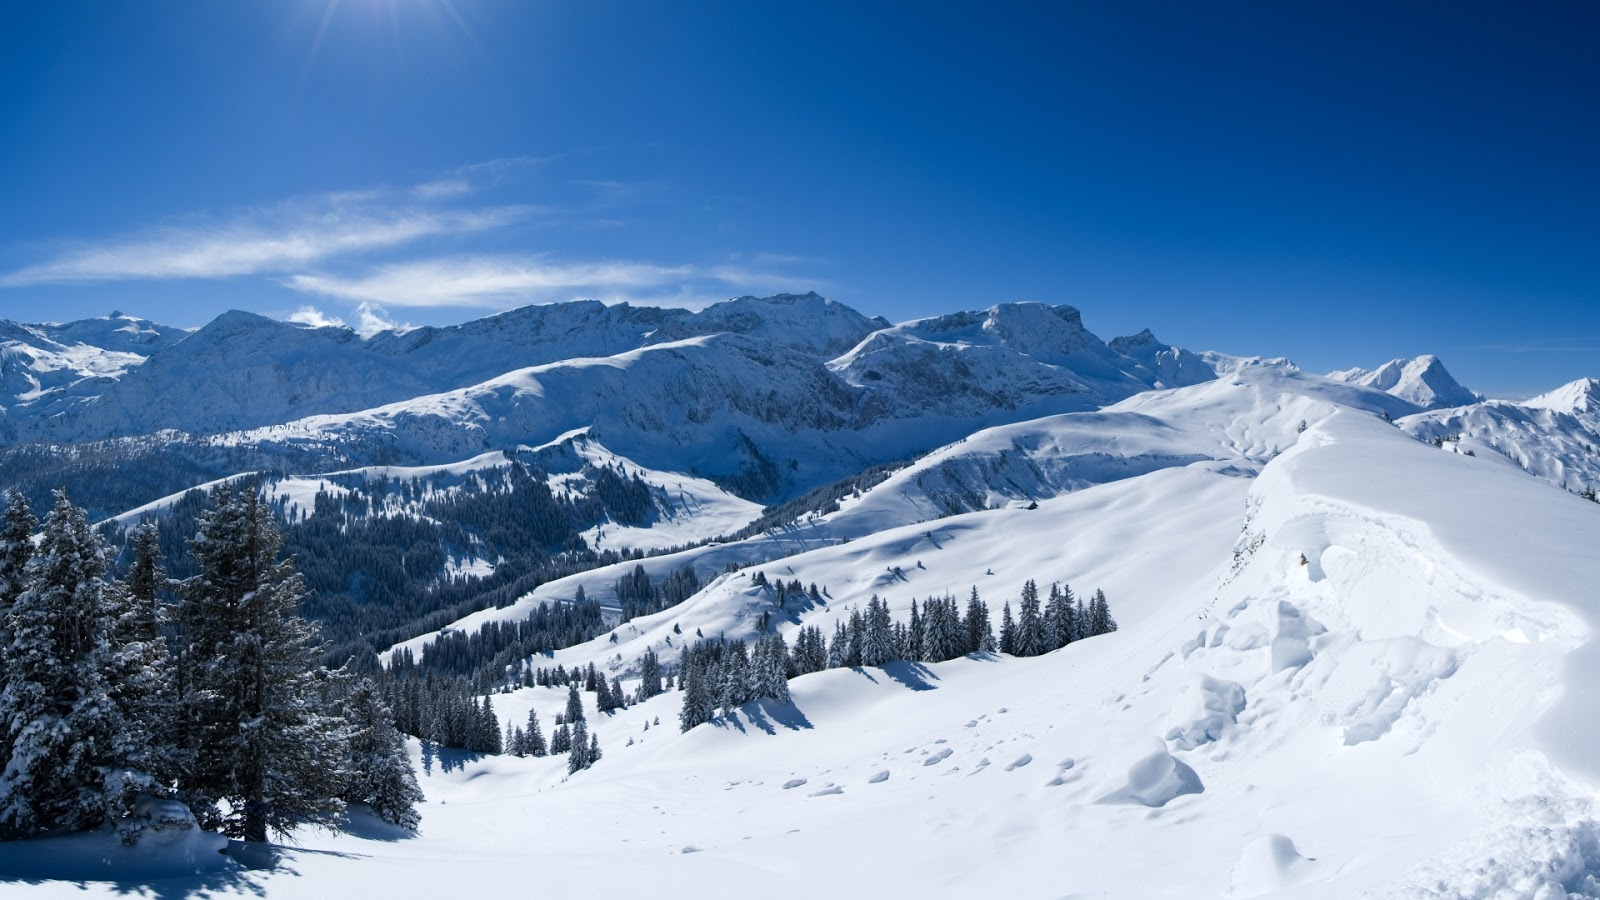 snowfall wallpaper desktop 1080p - photo #14